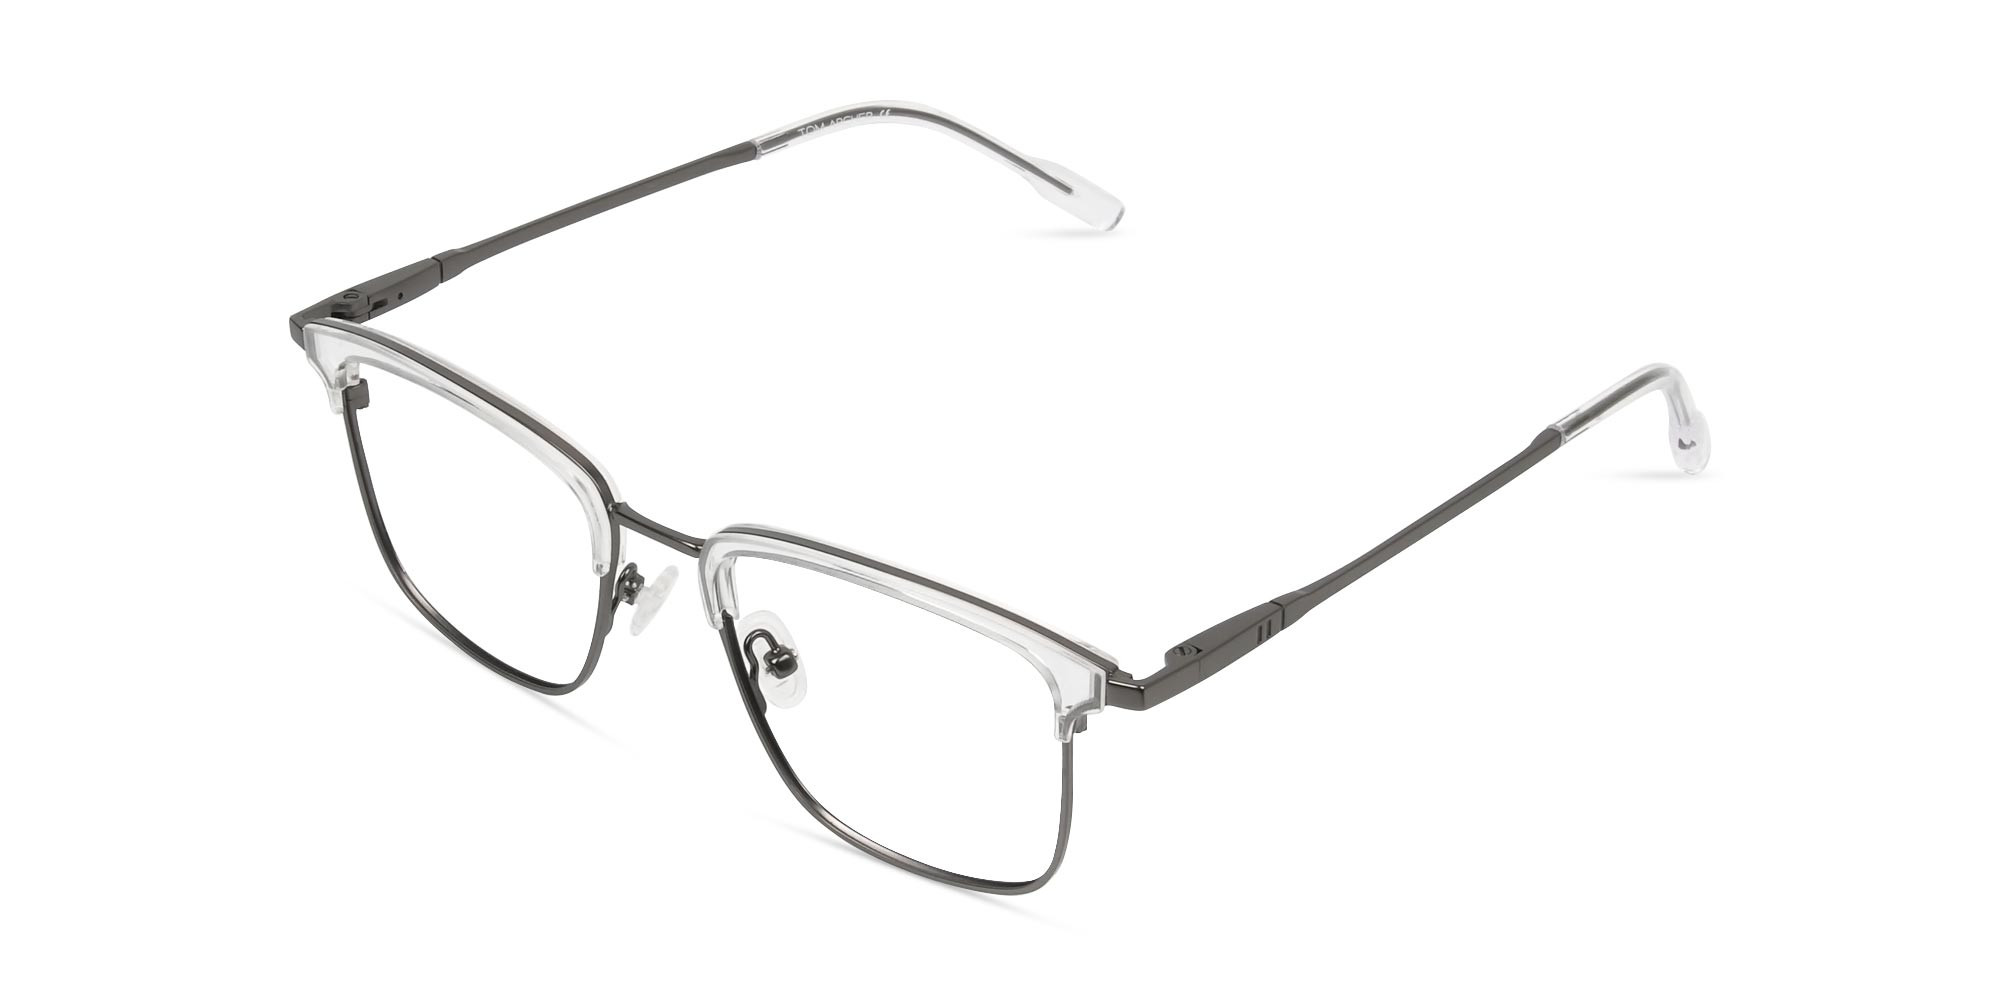 Transparent and Gunmetal Frames in Metal - 3